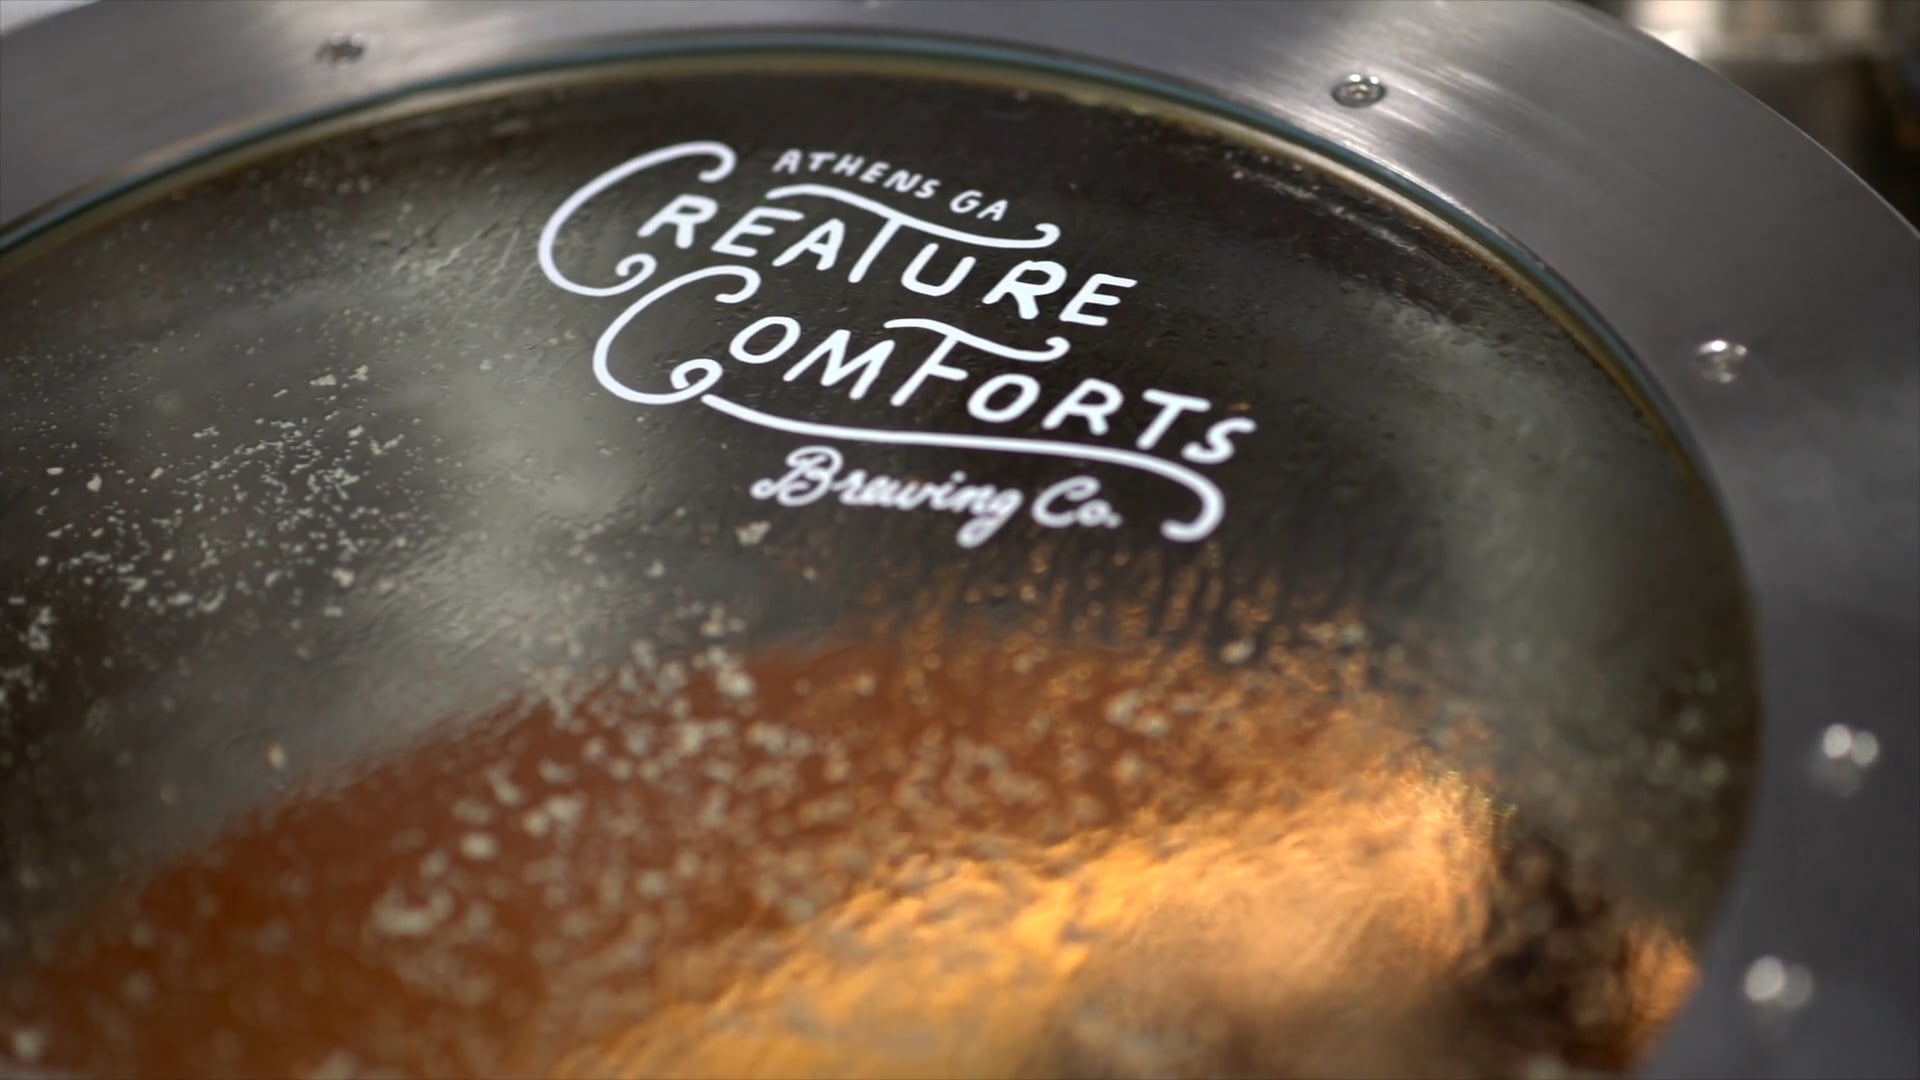 Creature Comforts Testimonial